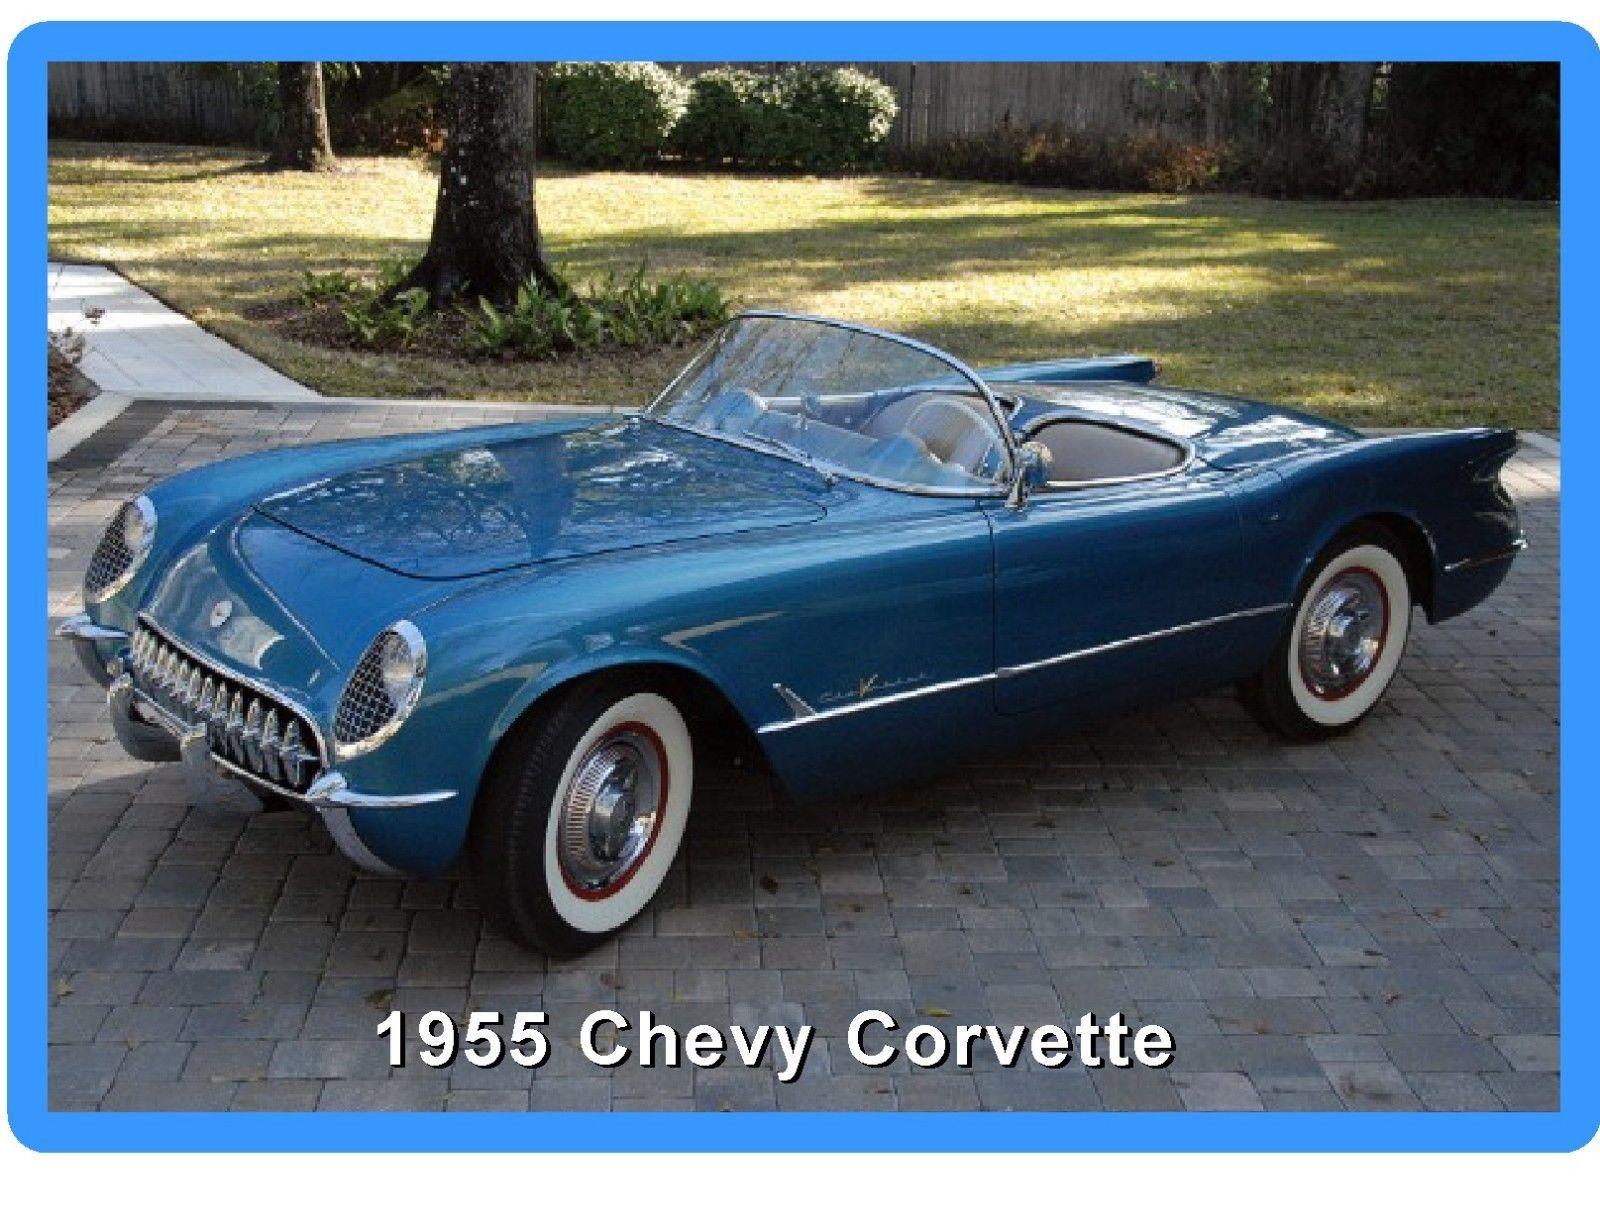 1961 Corvette Convertible Refrigerator Magnet